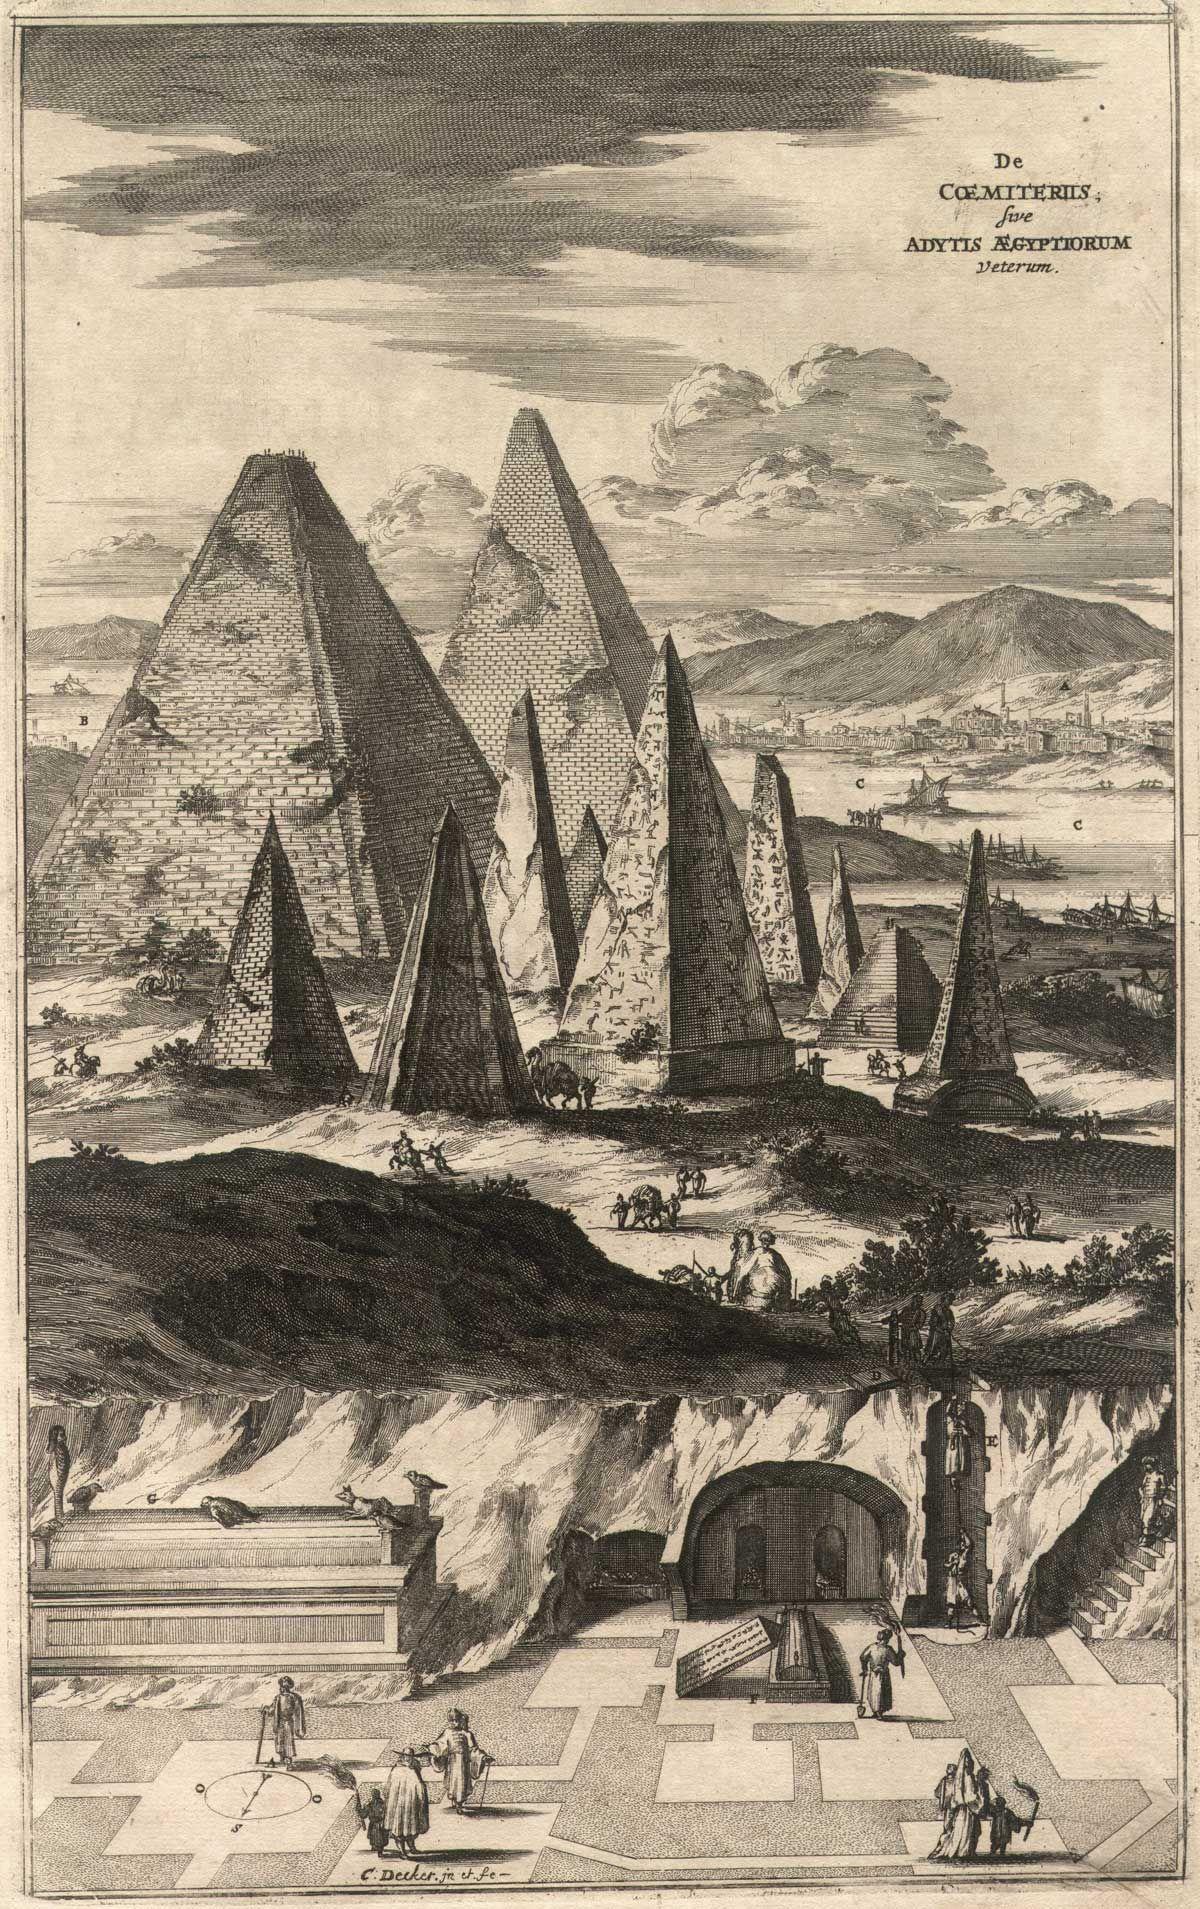 The pyramids of Nubia